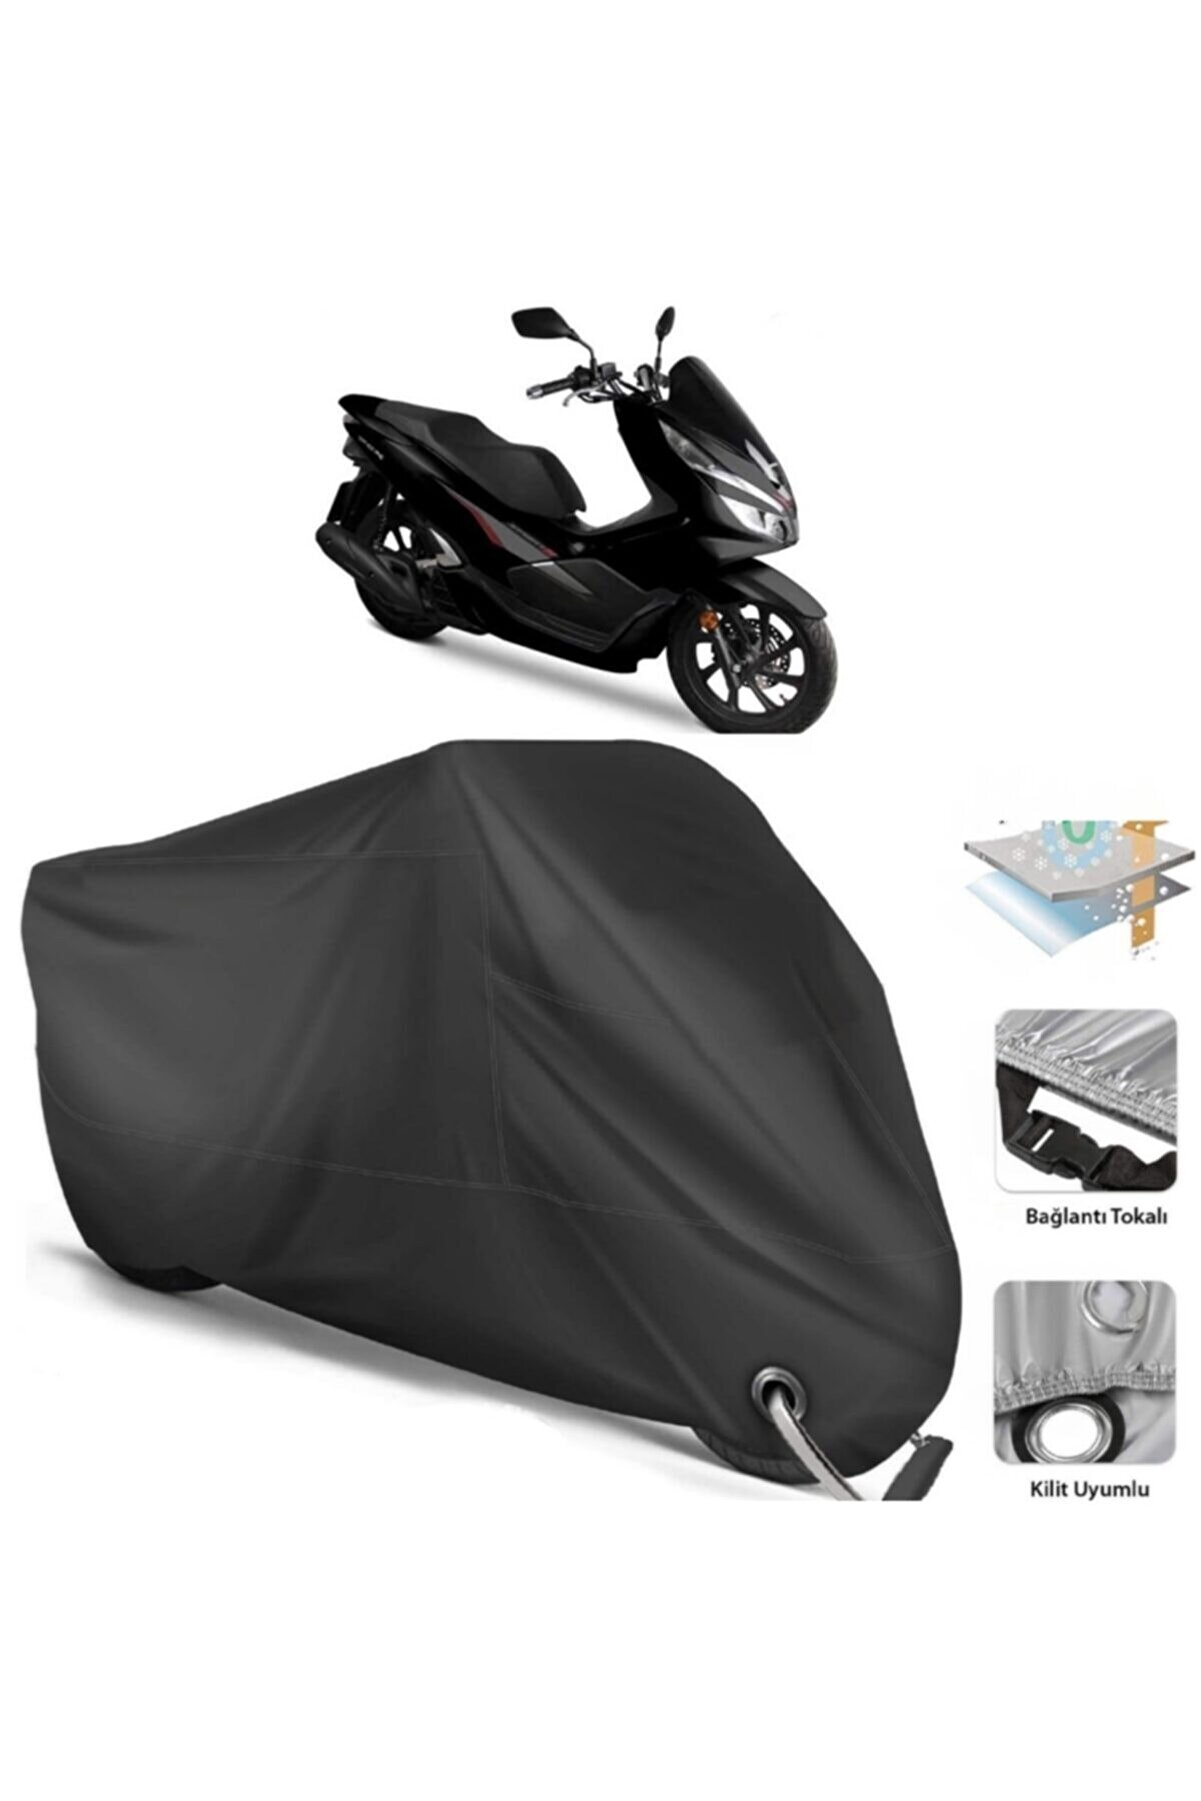 CoverPlus Honda Pcx Motor Brandası Arka Çanta Uyumlu (bağlantı, Kilit Uyumlu)-siyah